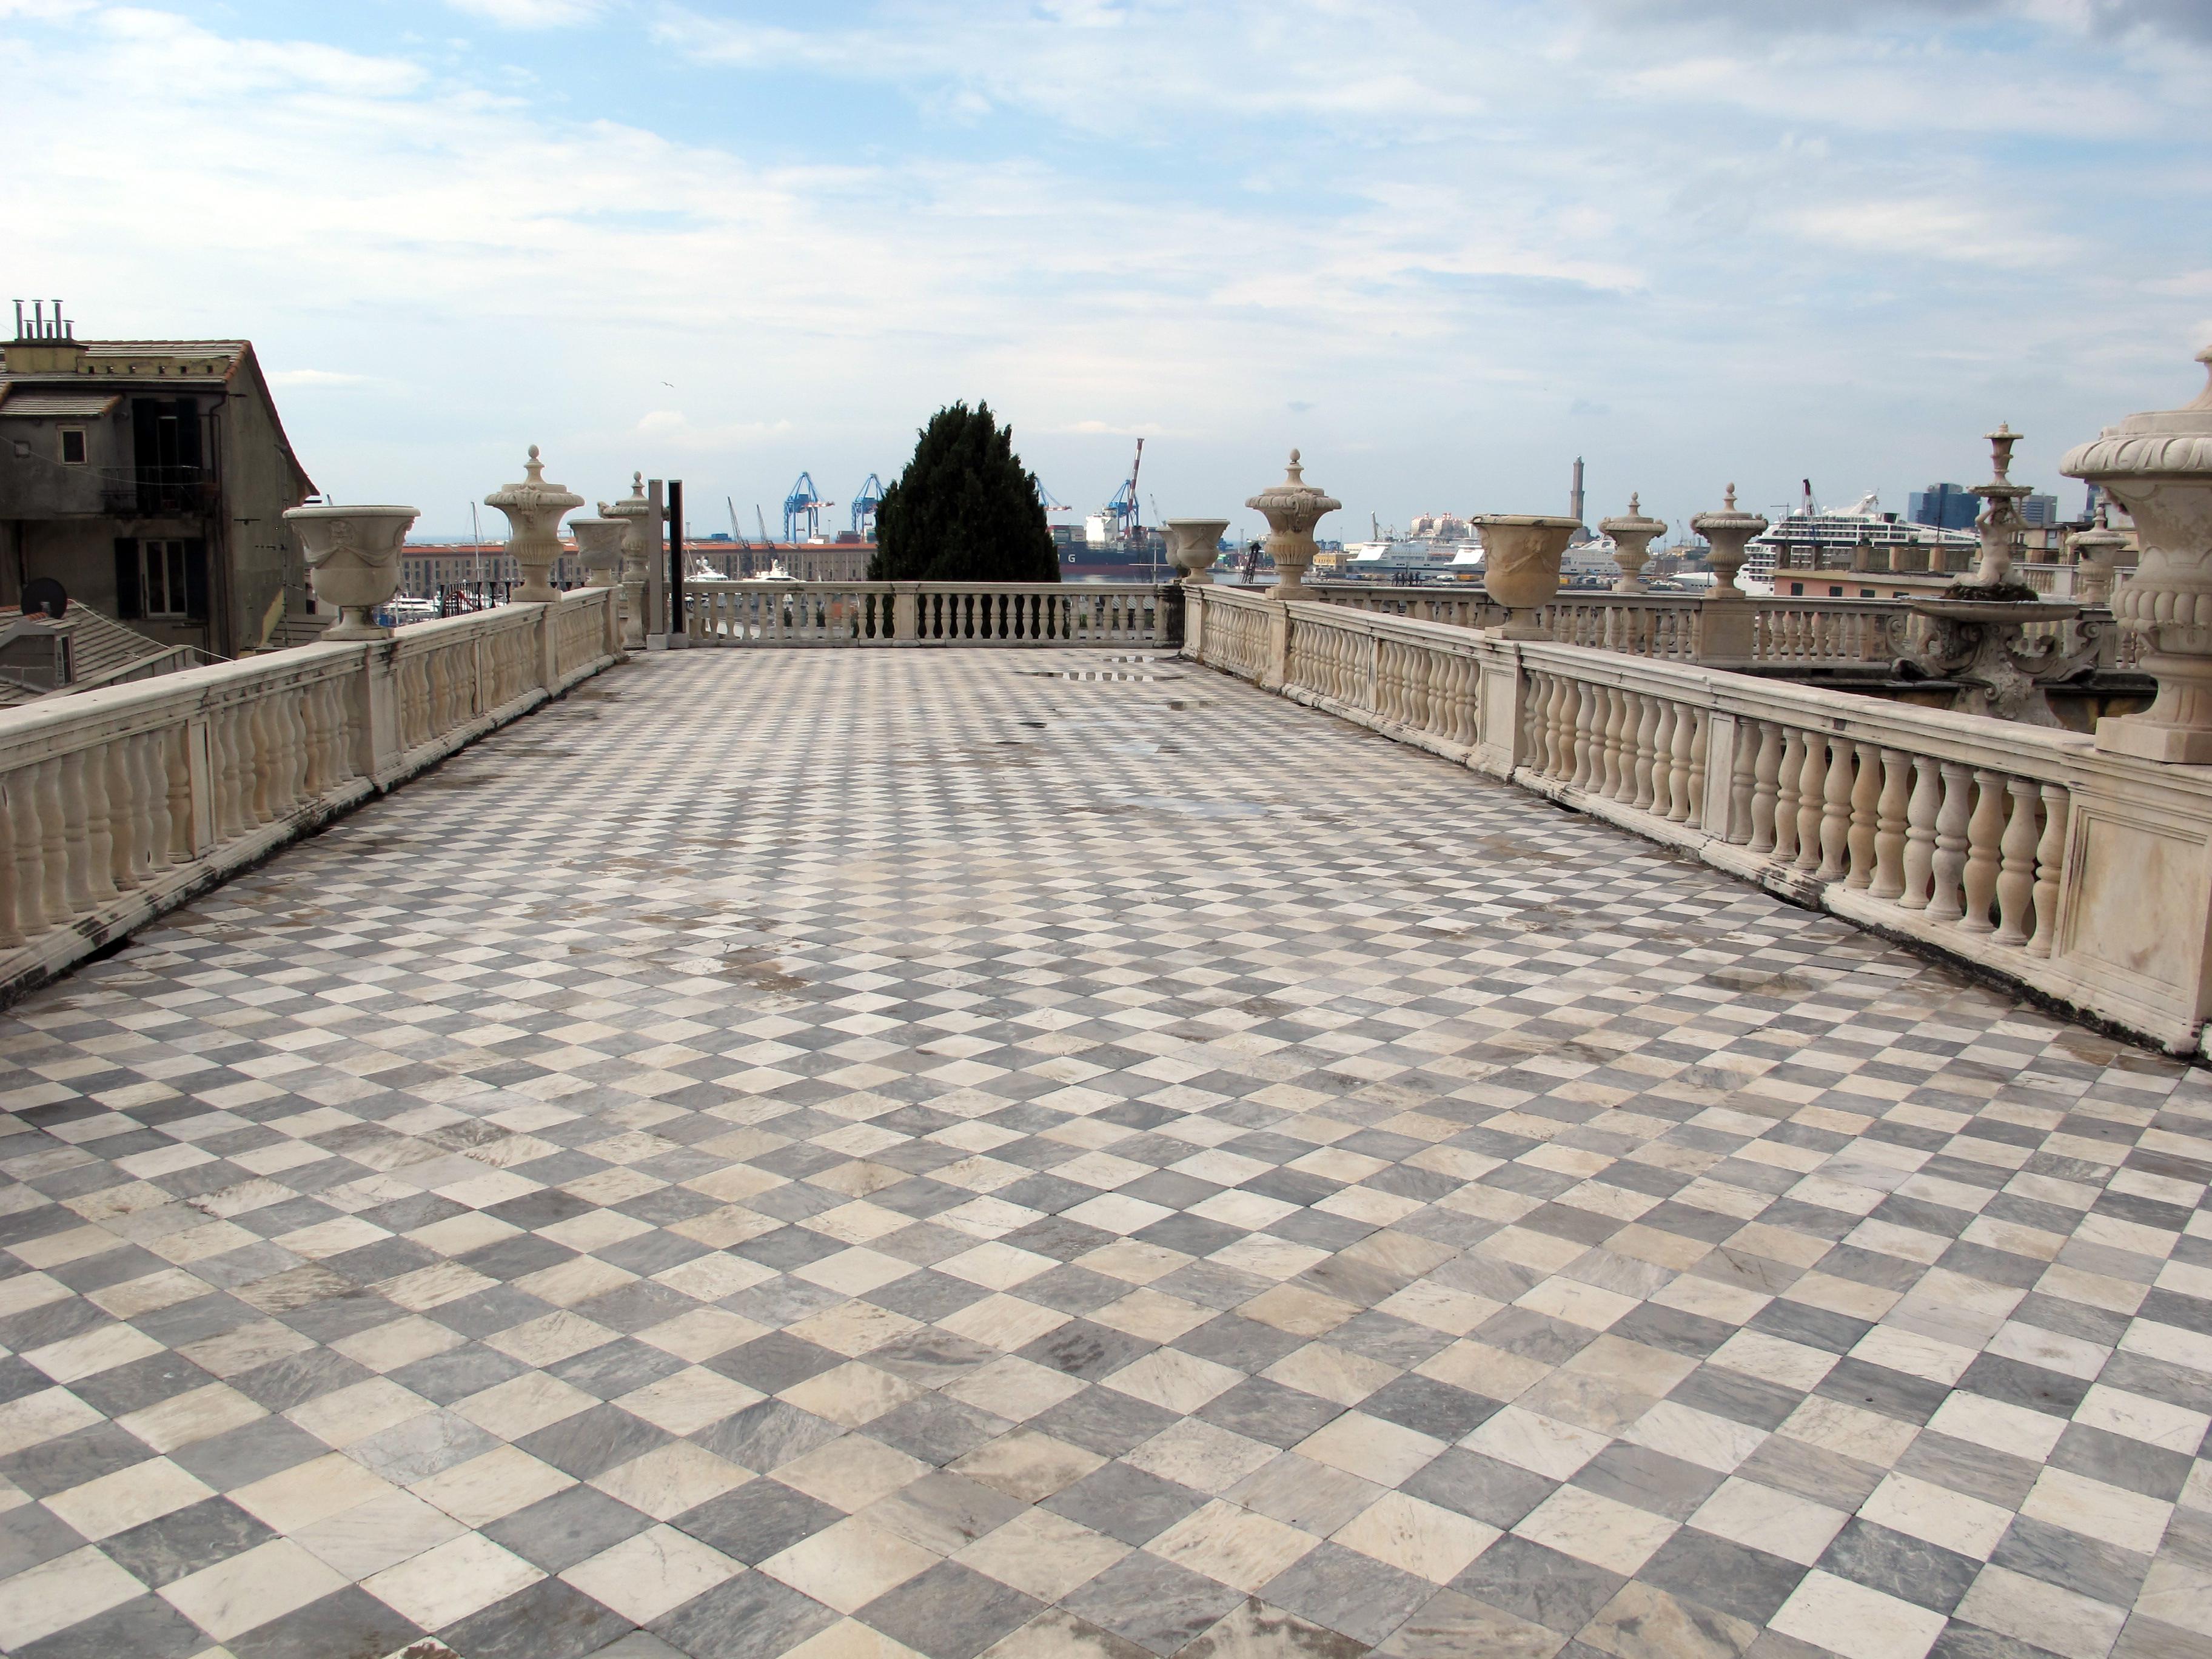 File:Genova, palazzo reale, terrazza 01.JPG - Wikimedia Commons